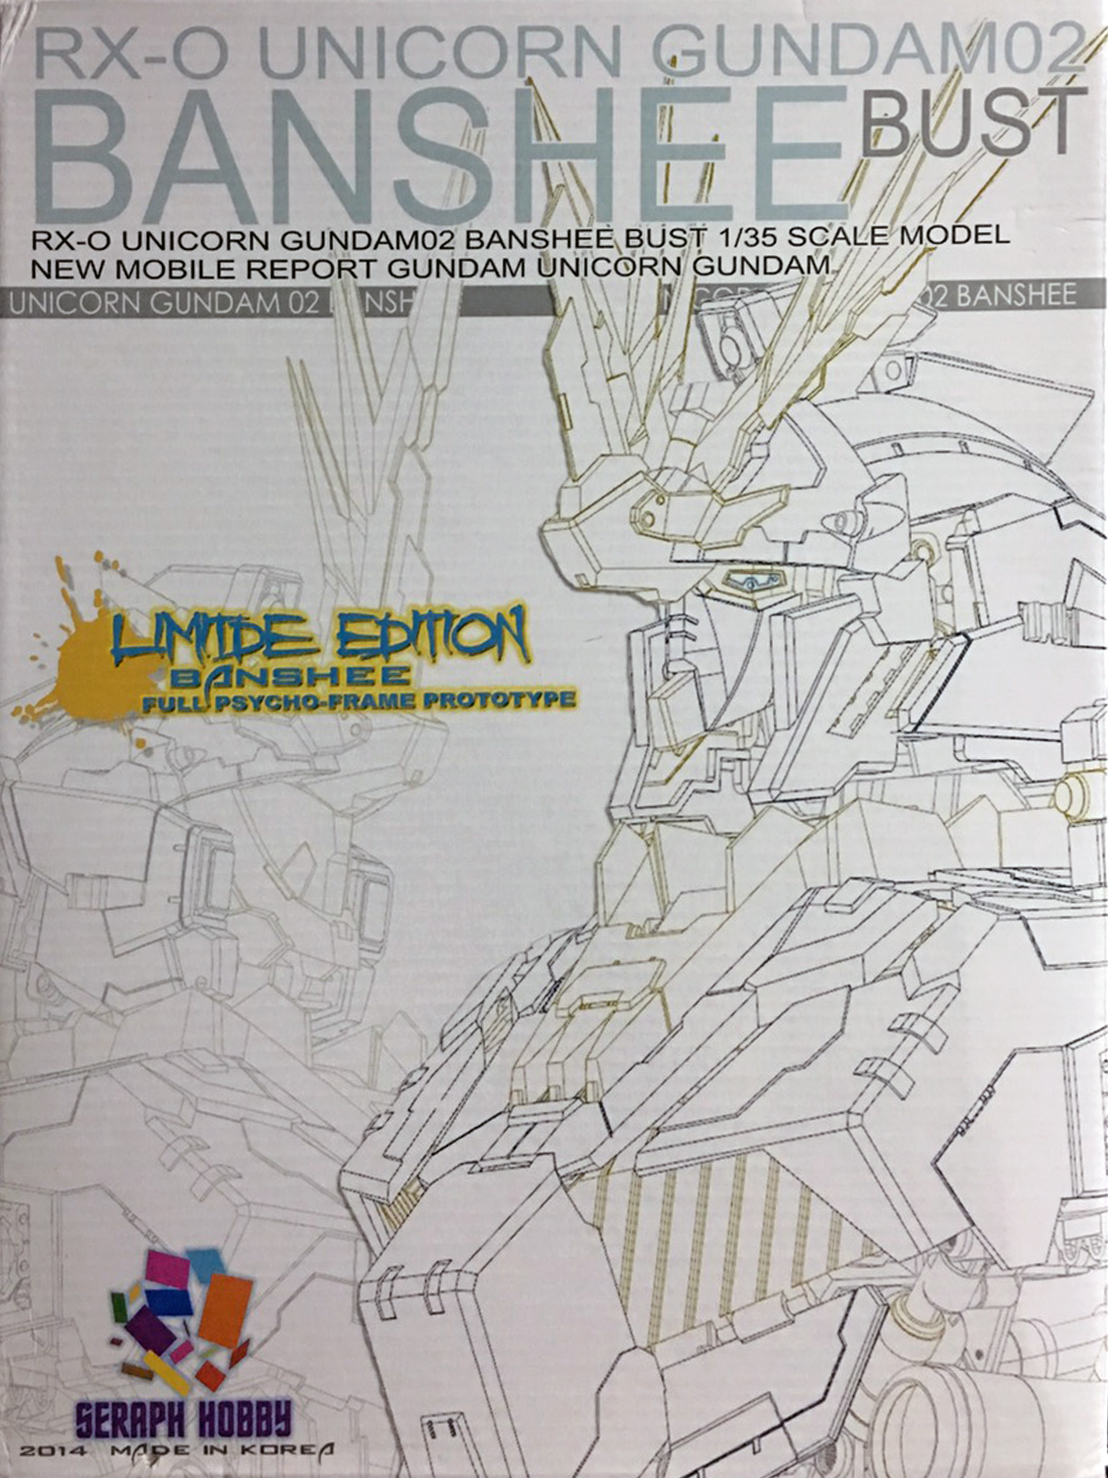 1/35 Display Head RX-O Unicorn Gundam Banshee Bust